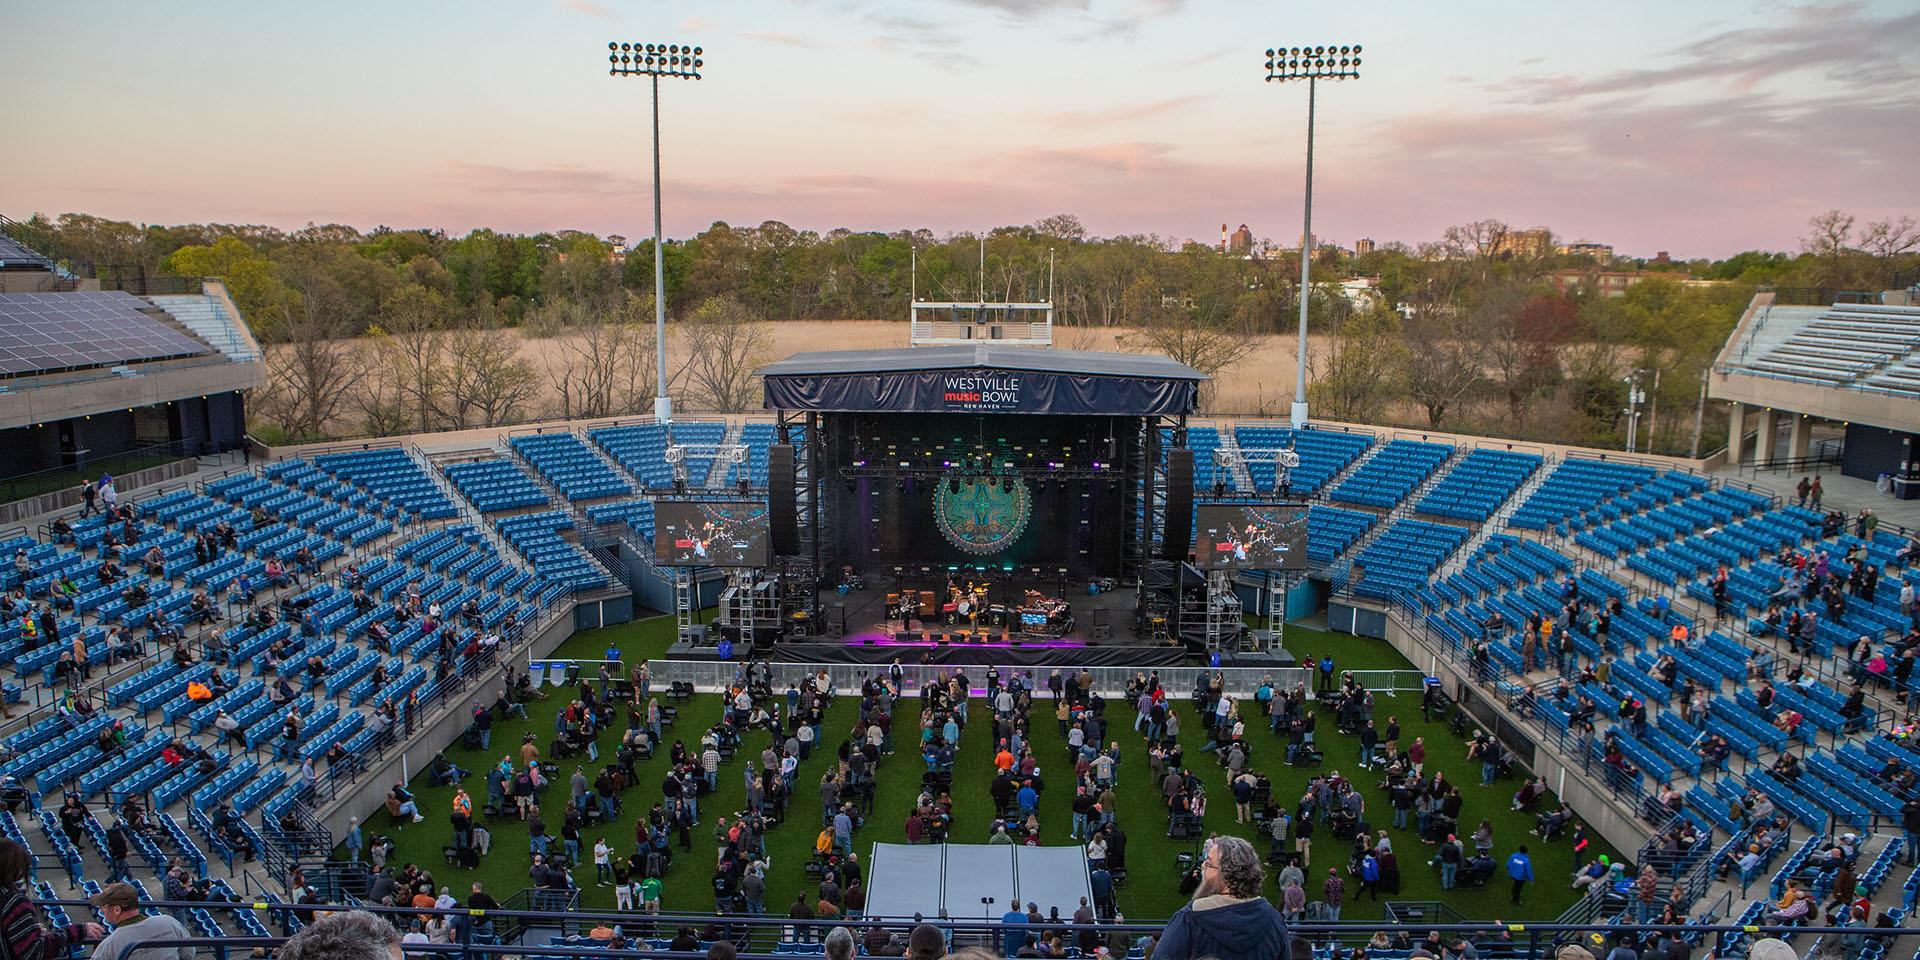 Former Tennis Stadium Serves Up Concerts